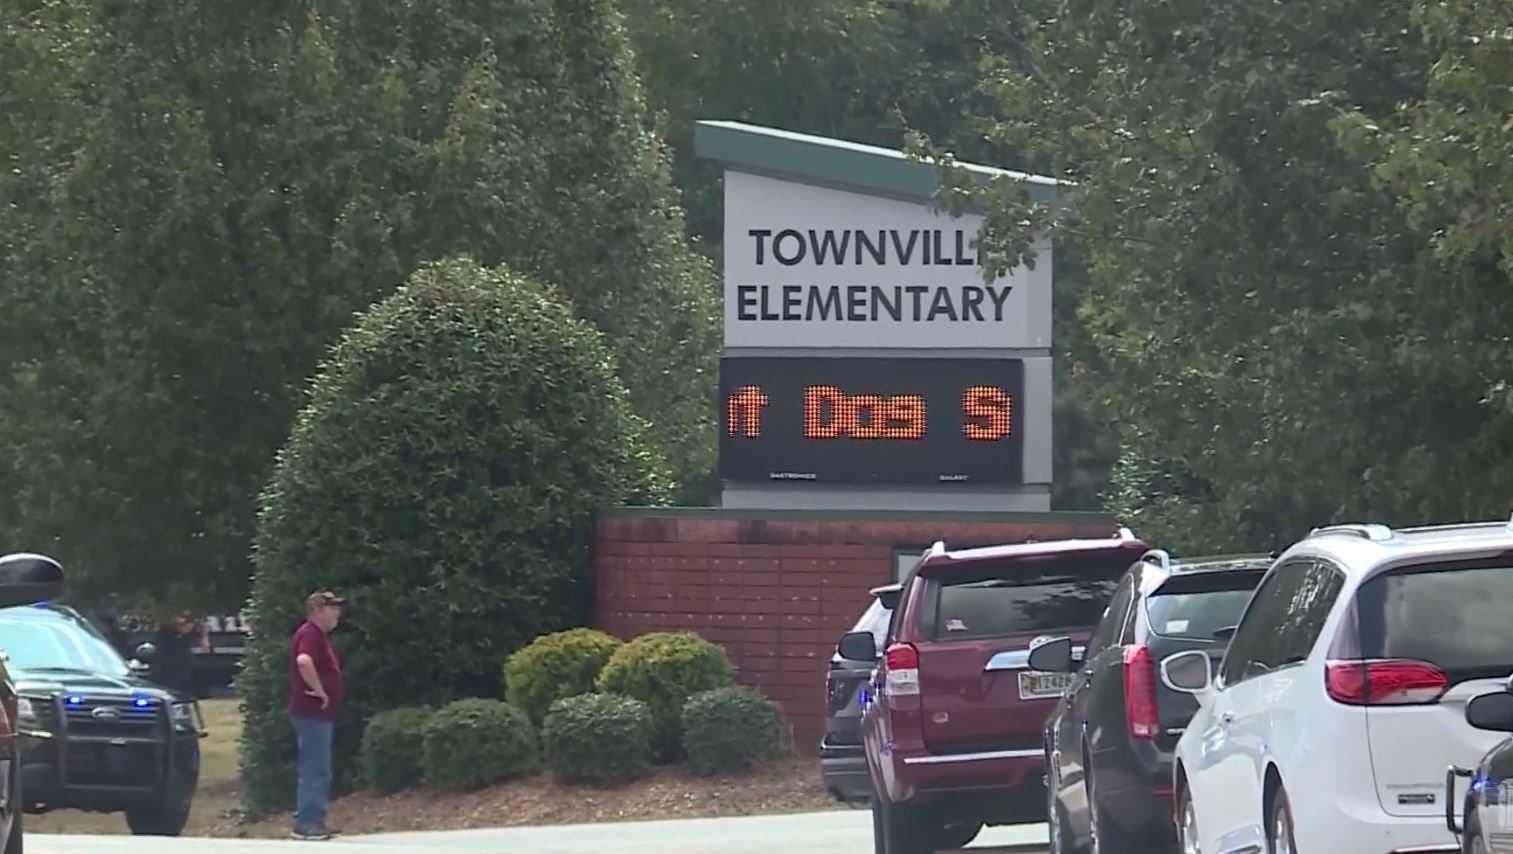 Townville Elementary School